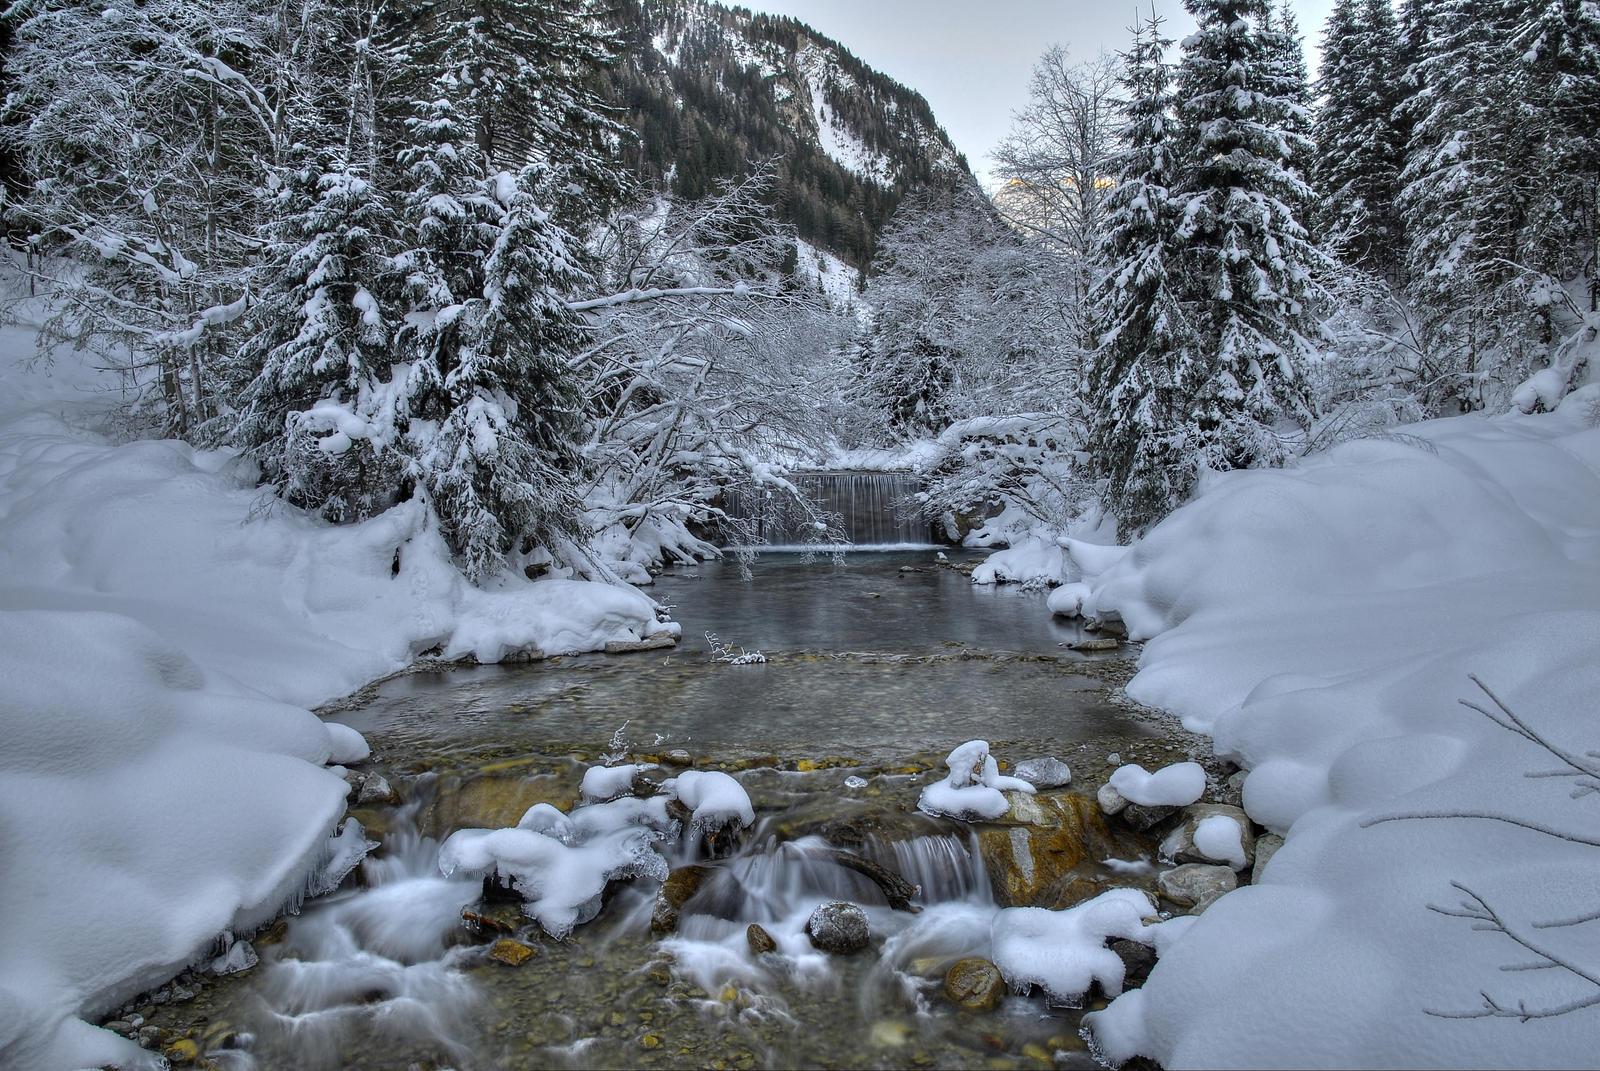 Snowy Riverscape by Burtn